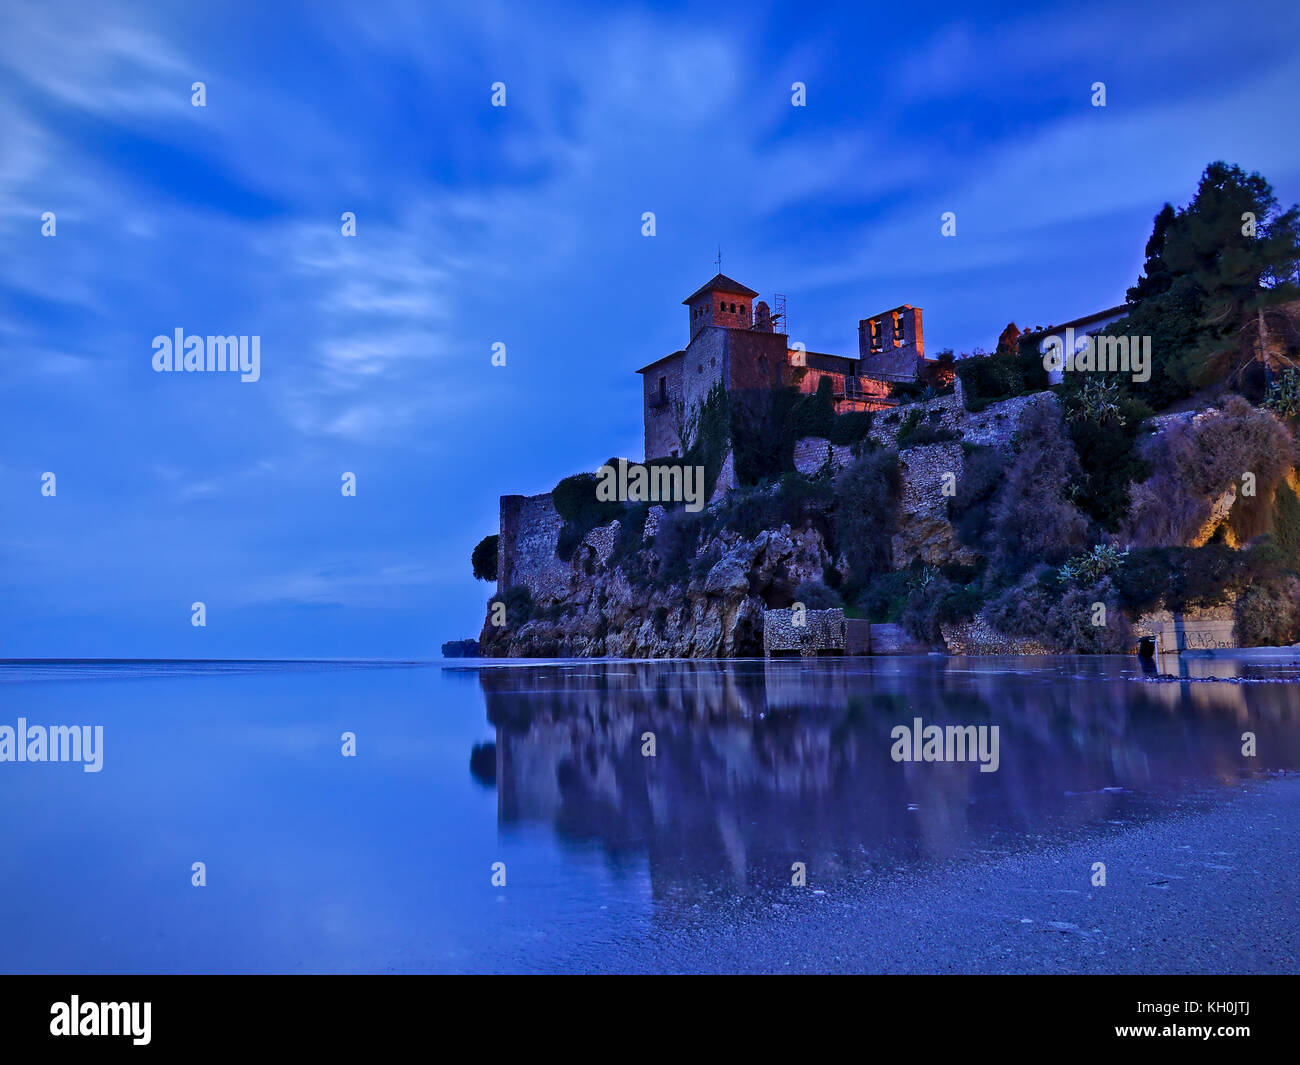 Night landscape, Castillo de Tamarit, Costa dorada,Spain,Tarragona Province - Stock Image